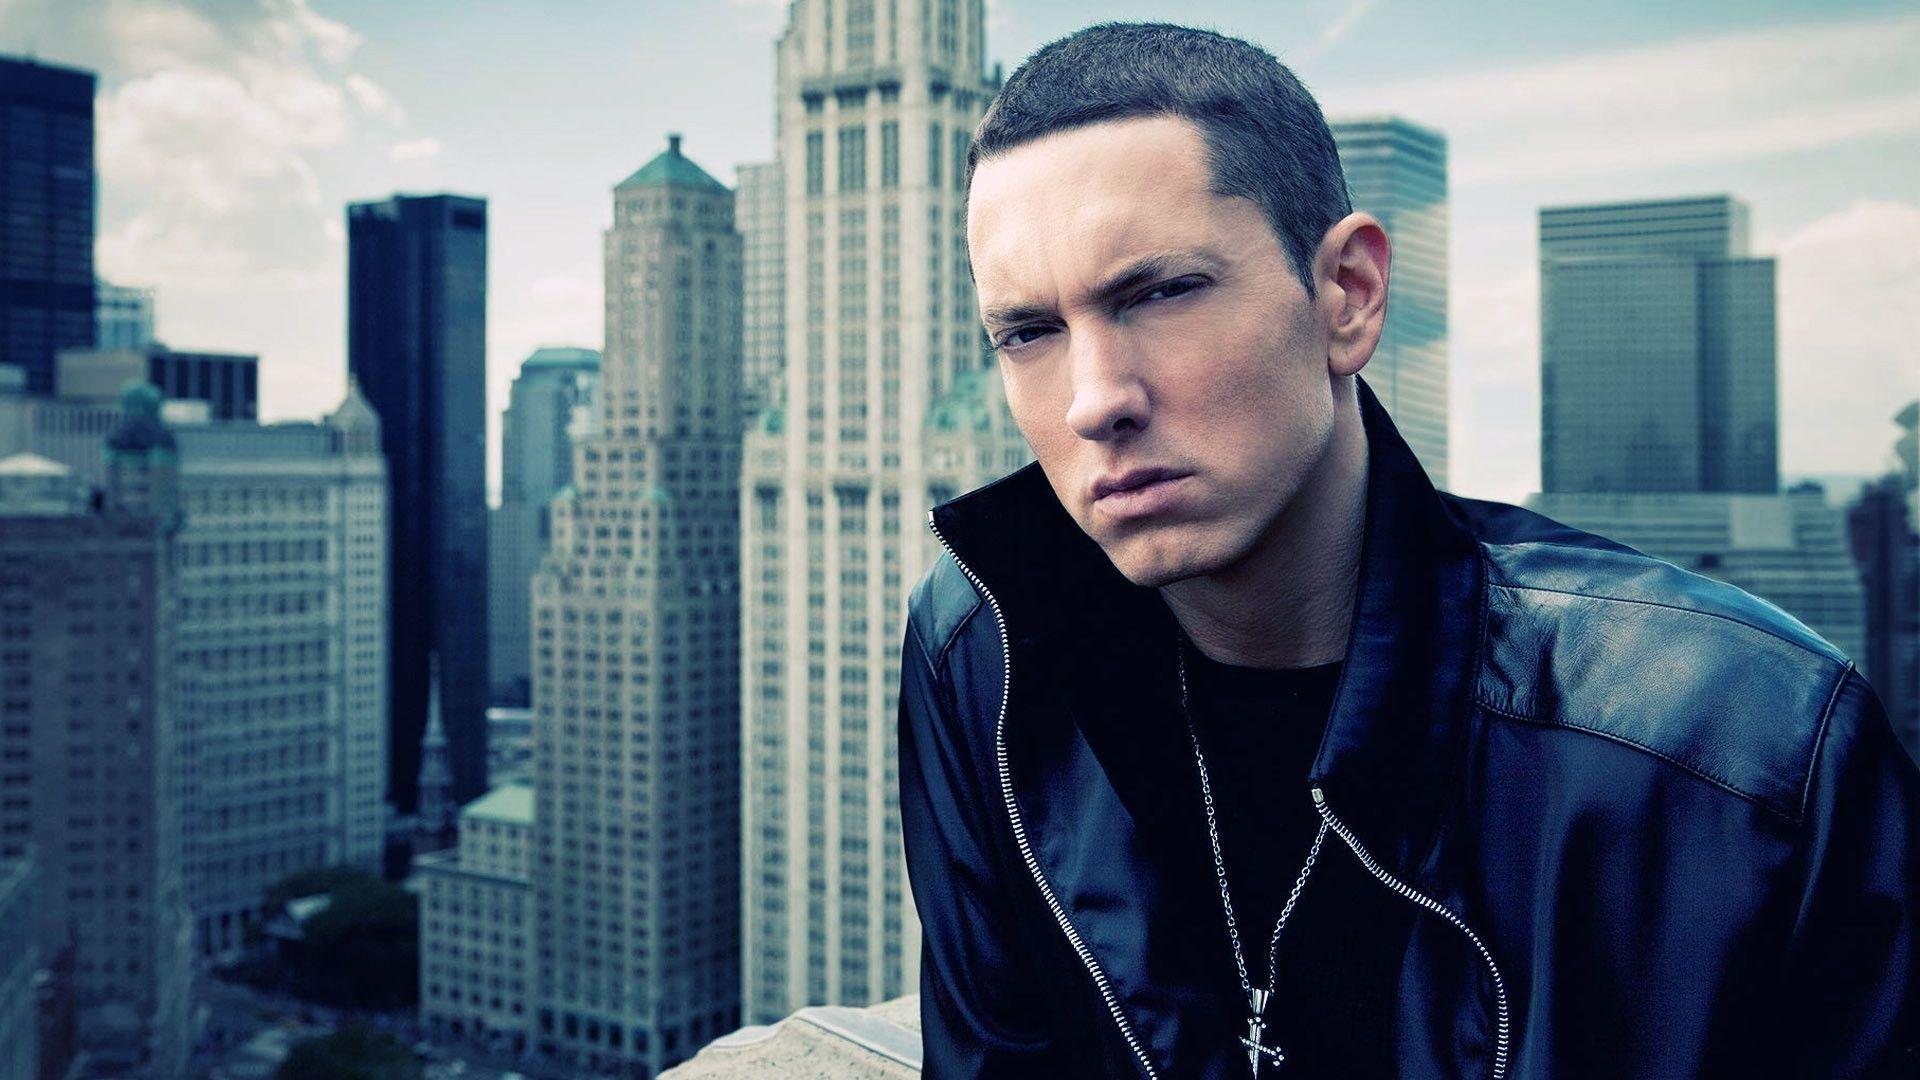 Eminem hd wallpapers wallpaper cave eminem hd wallpapers hd wallpapers inn voltagebd Choice Image